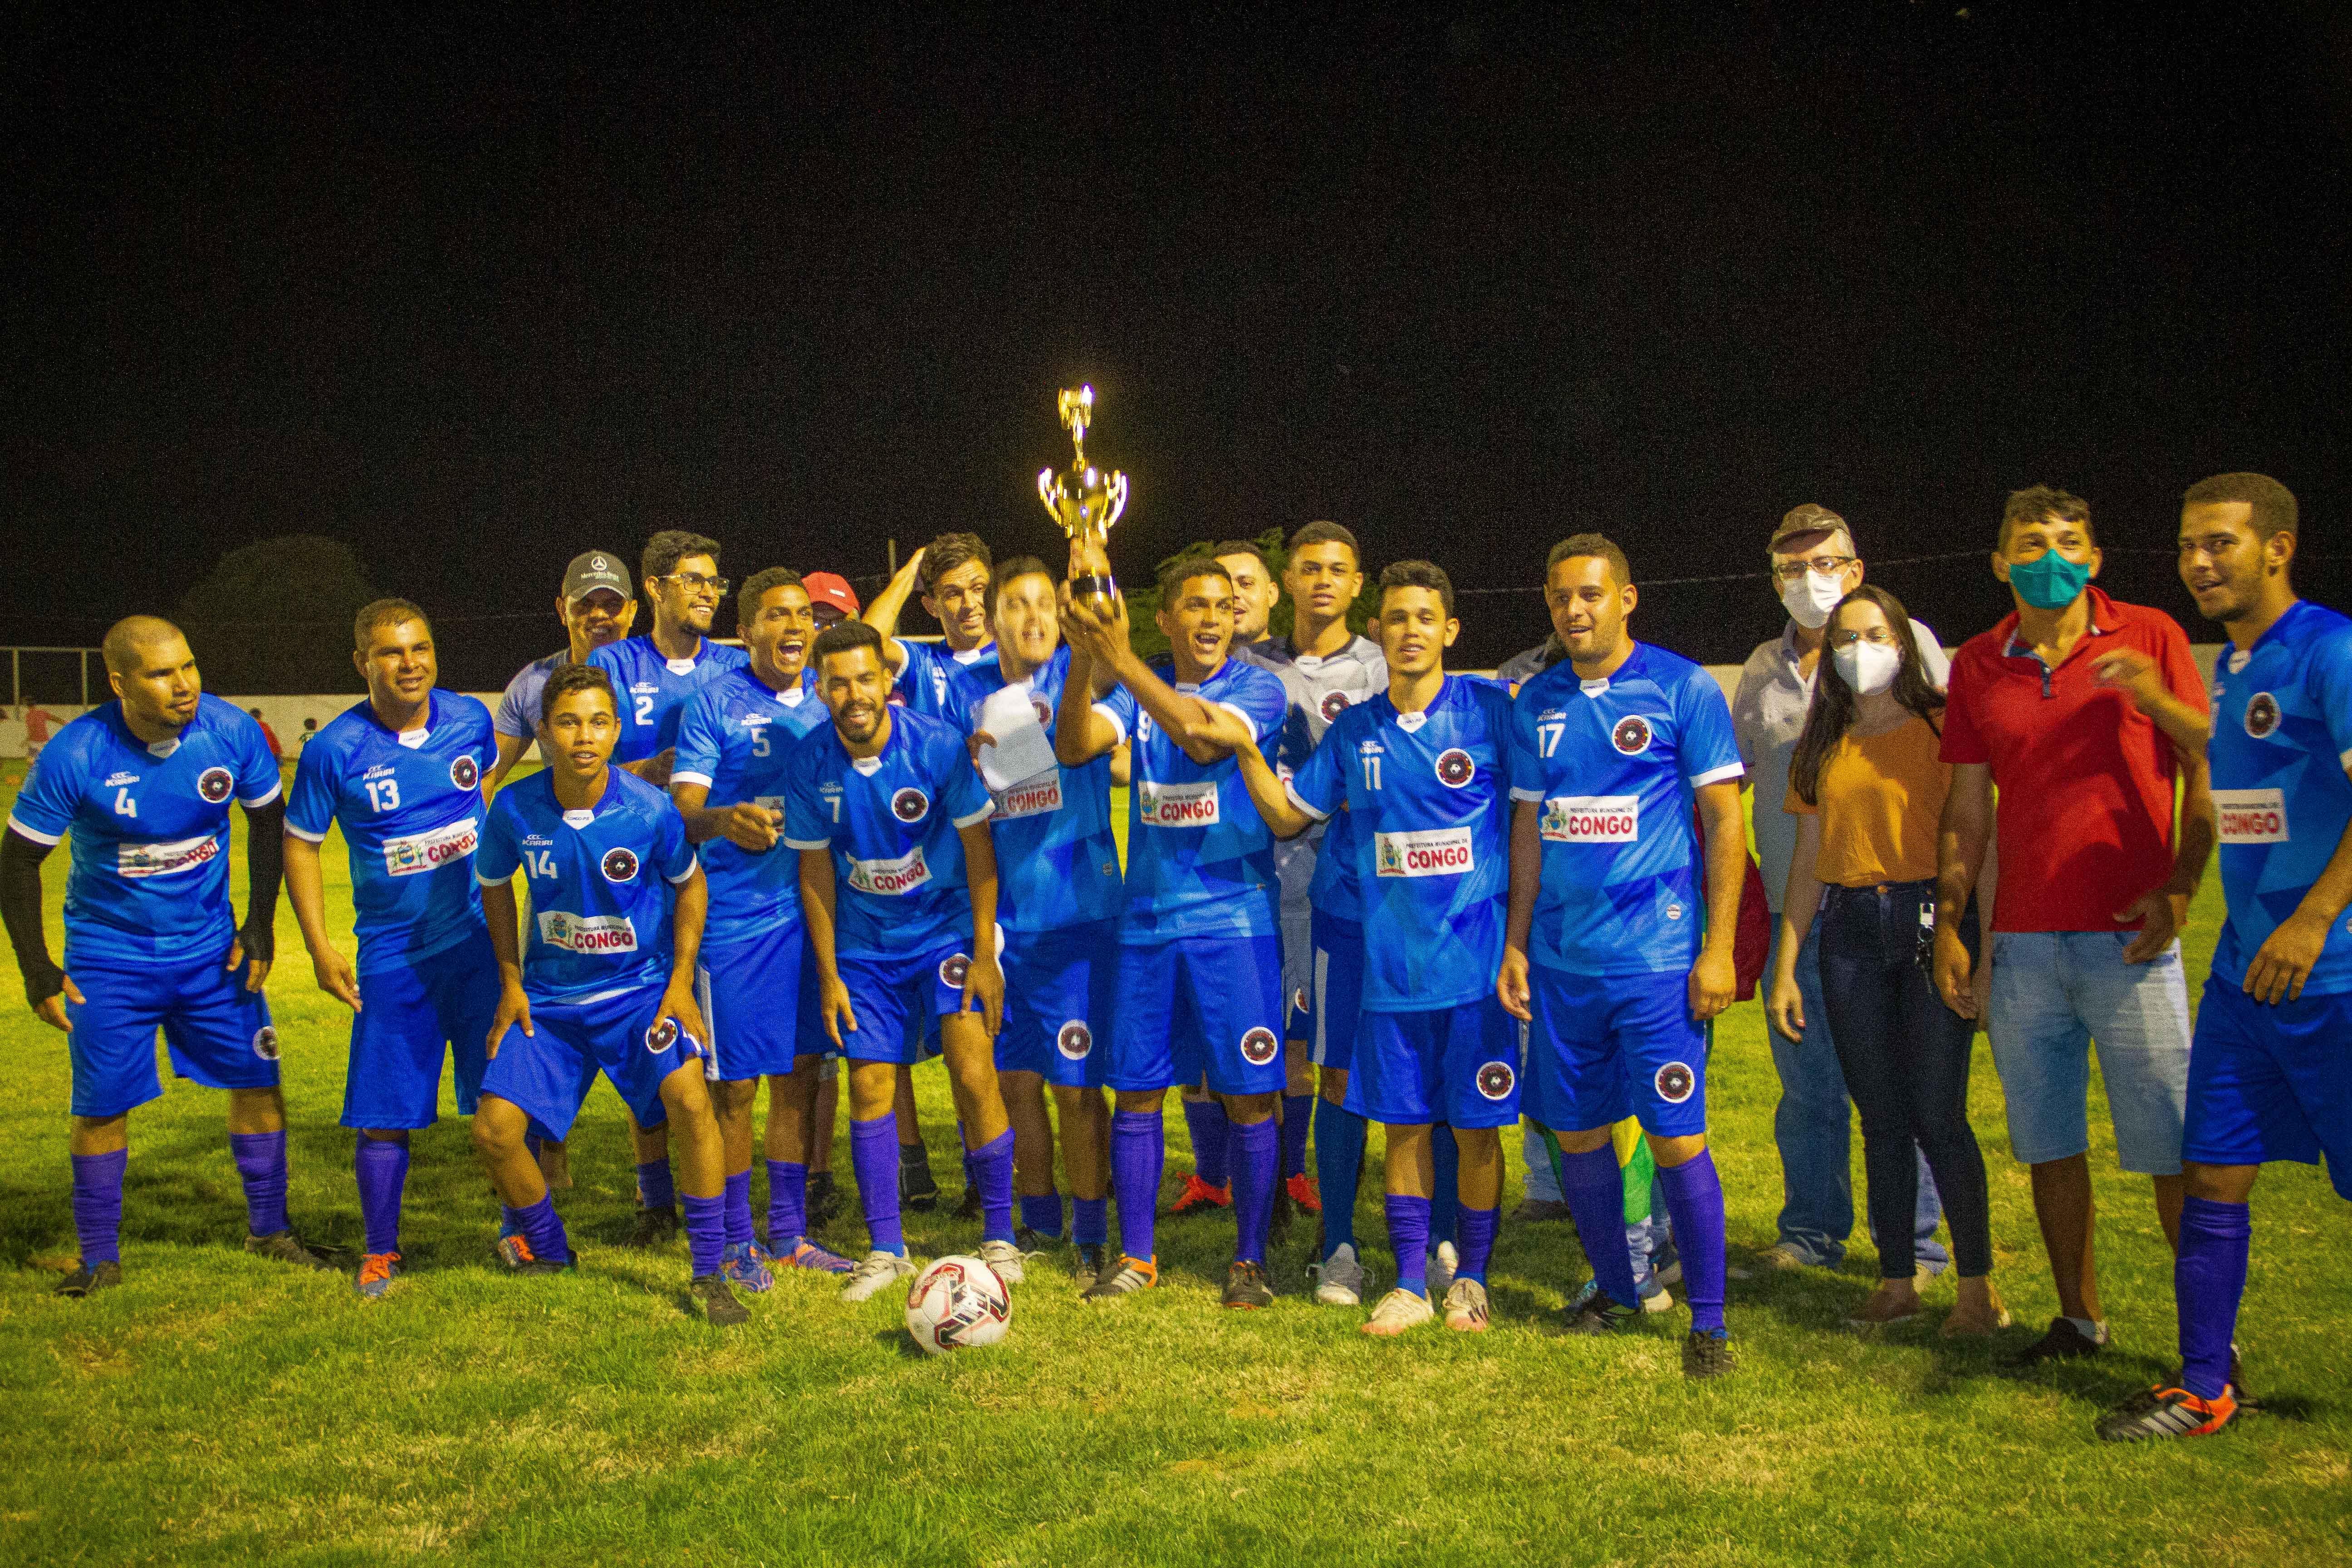 2021-09-07-torneio-da-independencia-francisco-cesar-0382.jpg